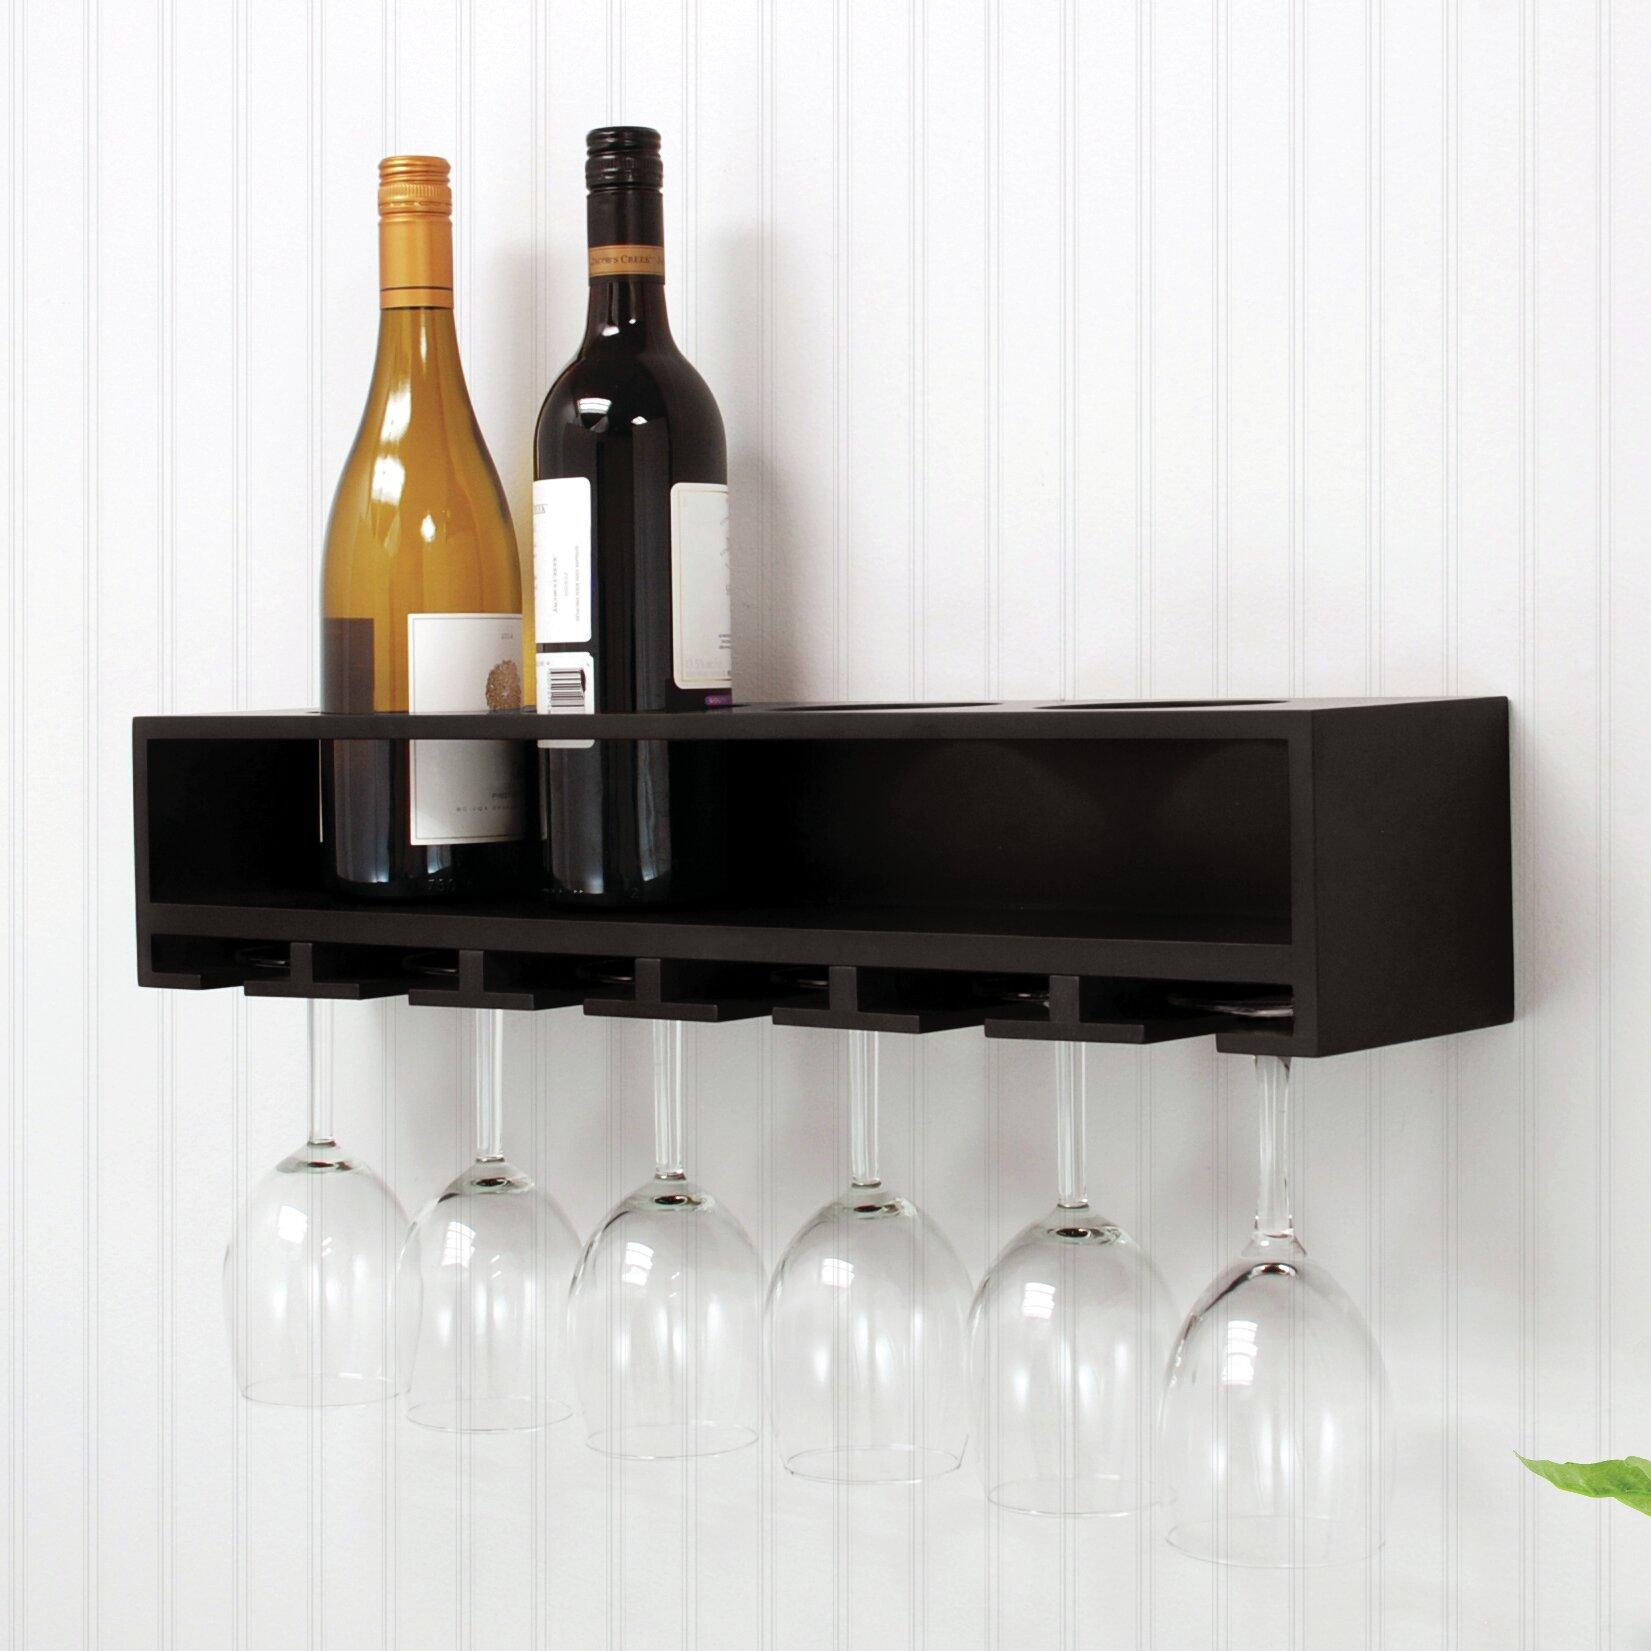 Nexxt design bottle wall mounted wine rack reviews